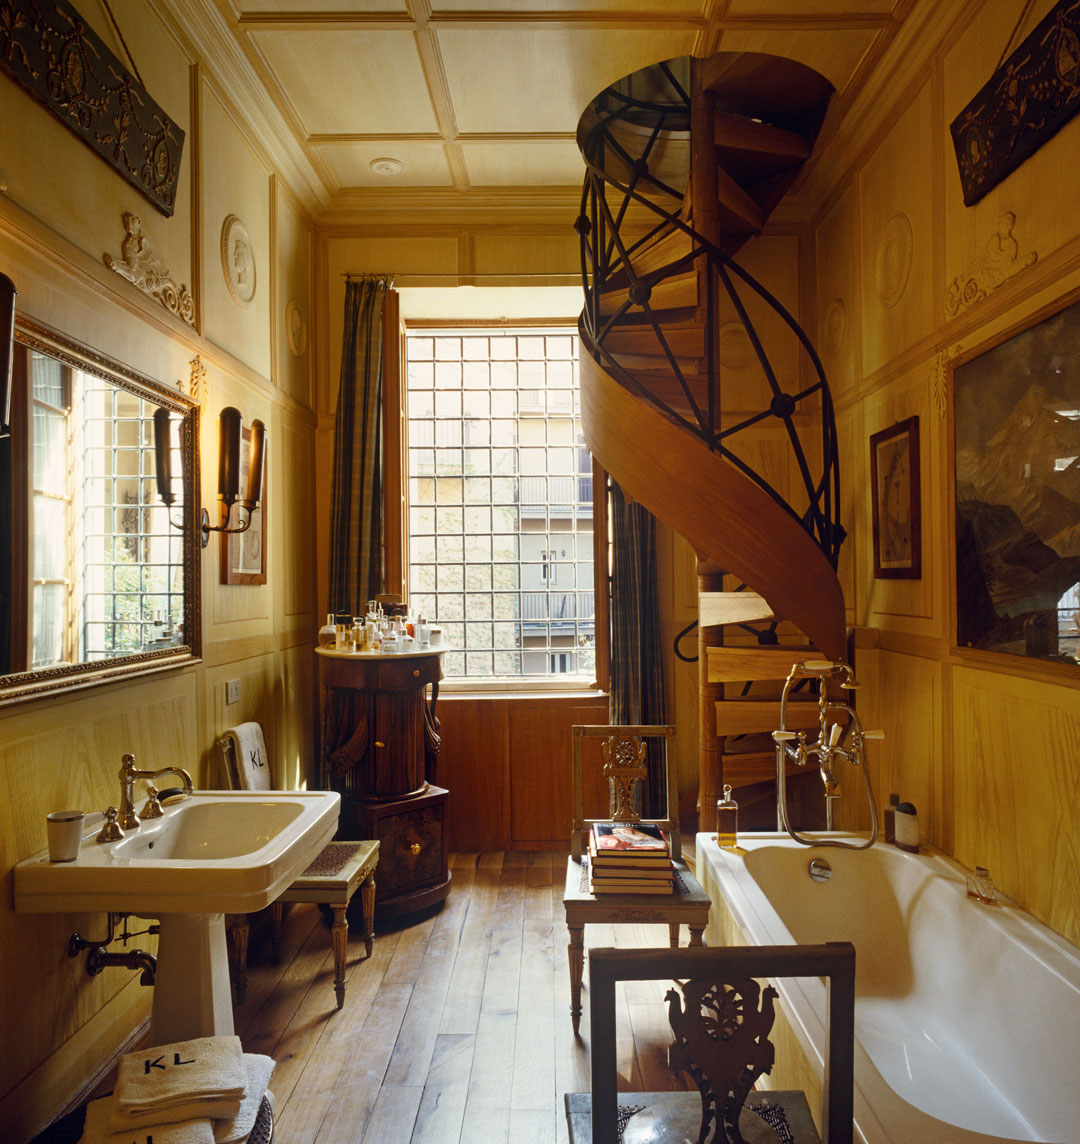 The Roman Bathroom Where Karl Lagerfeld